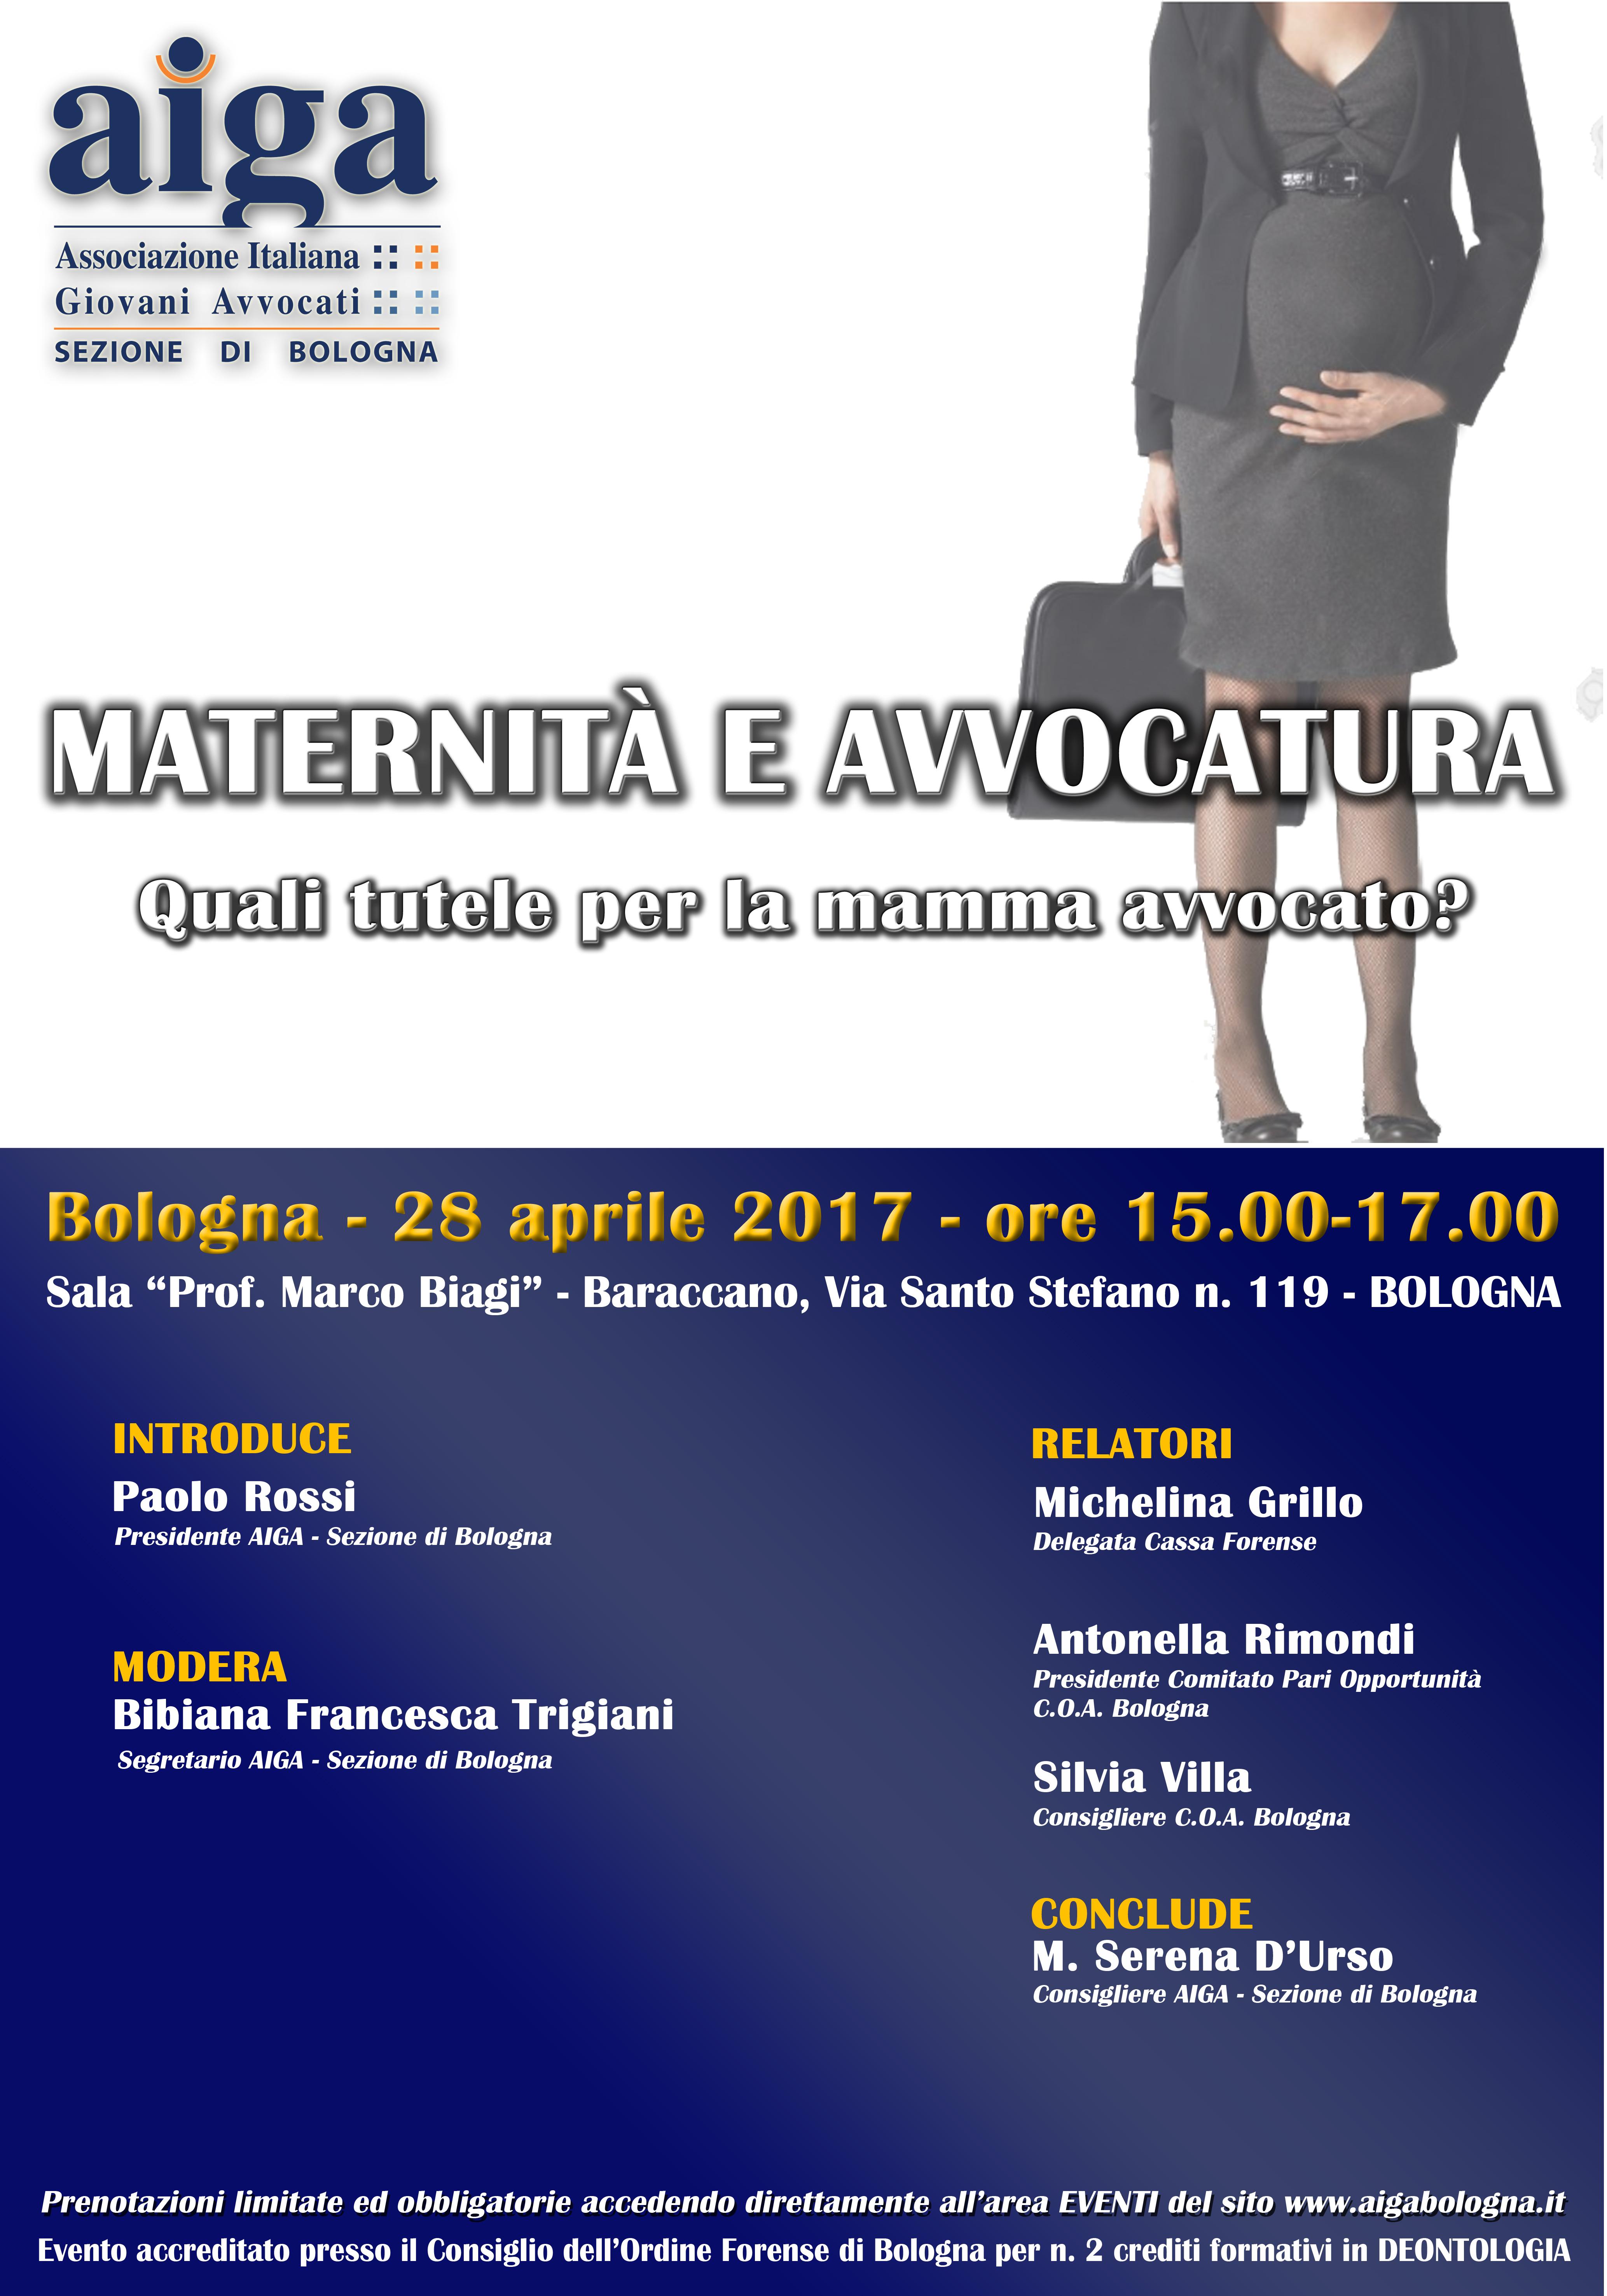 locandina-28-aprile-2017-maternita